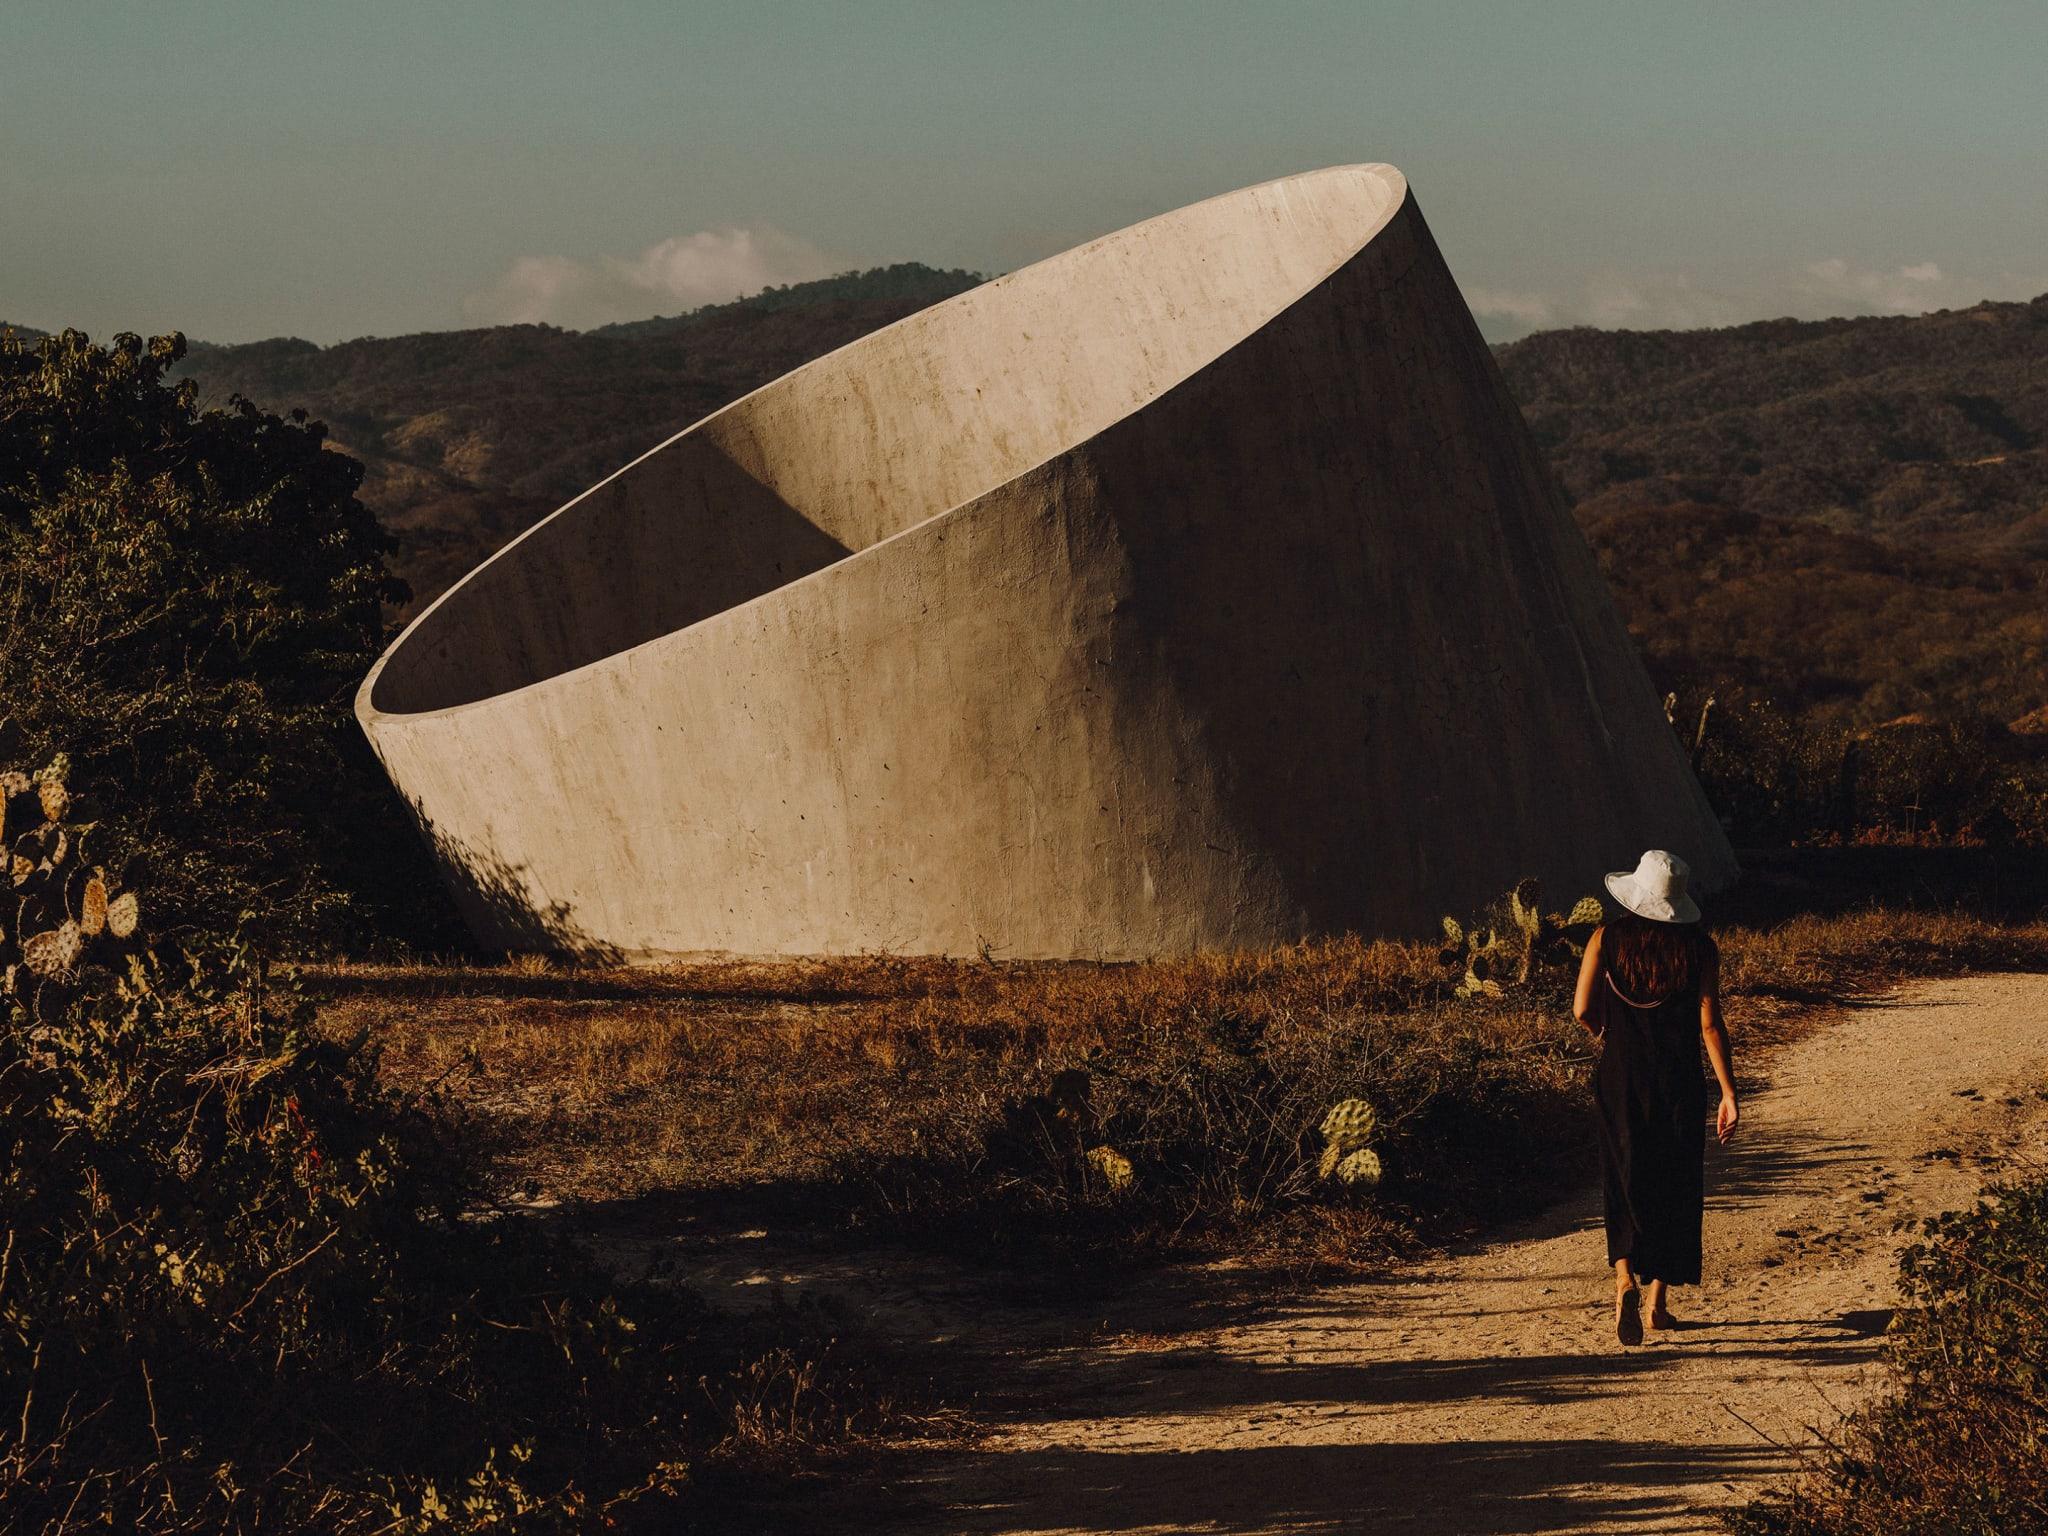 A woman walking towards a circular concrete structure.